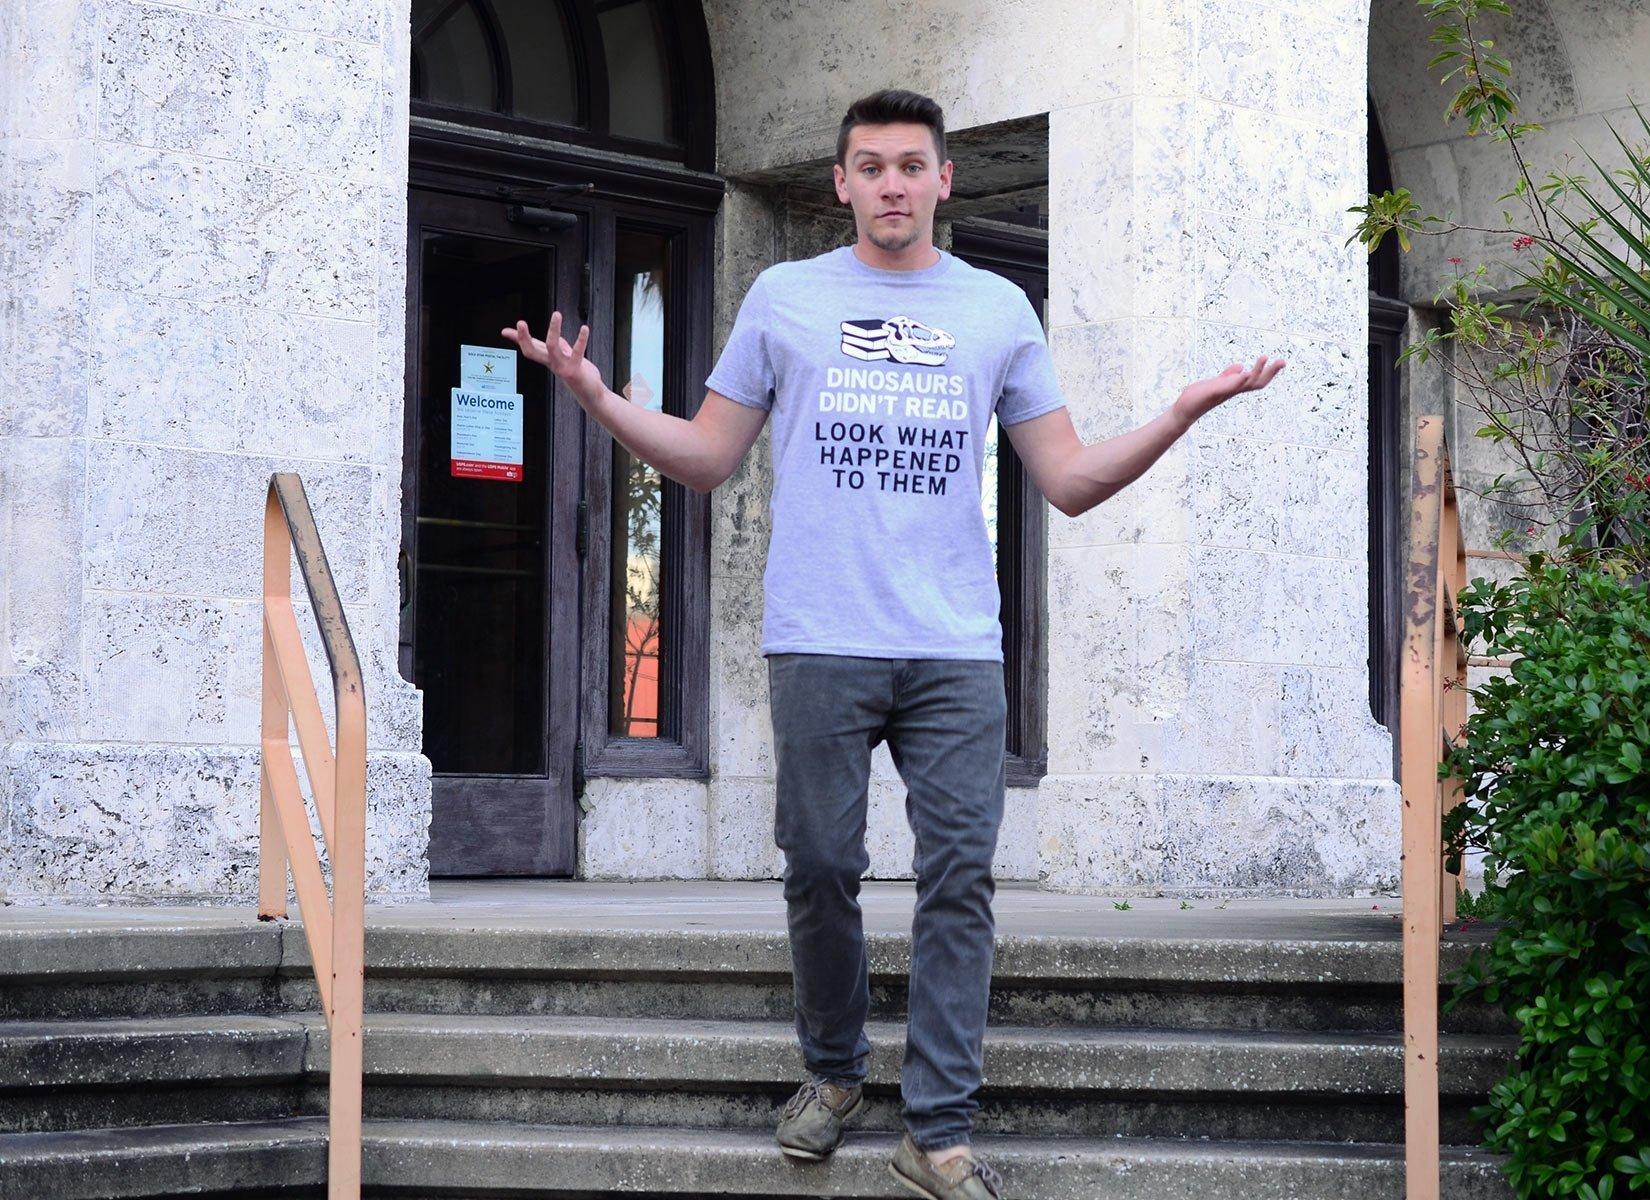 Dinosaurs Didn't Read on Mens T-Shirt